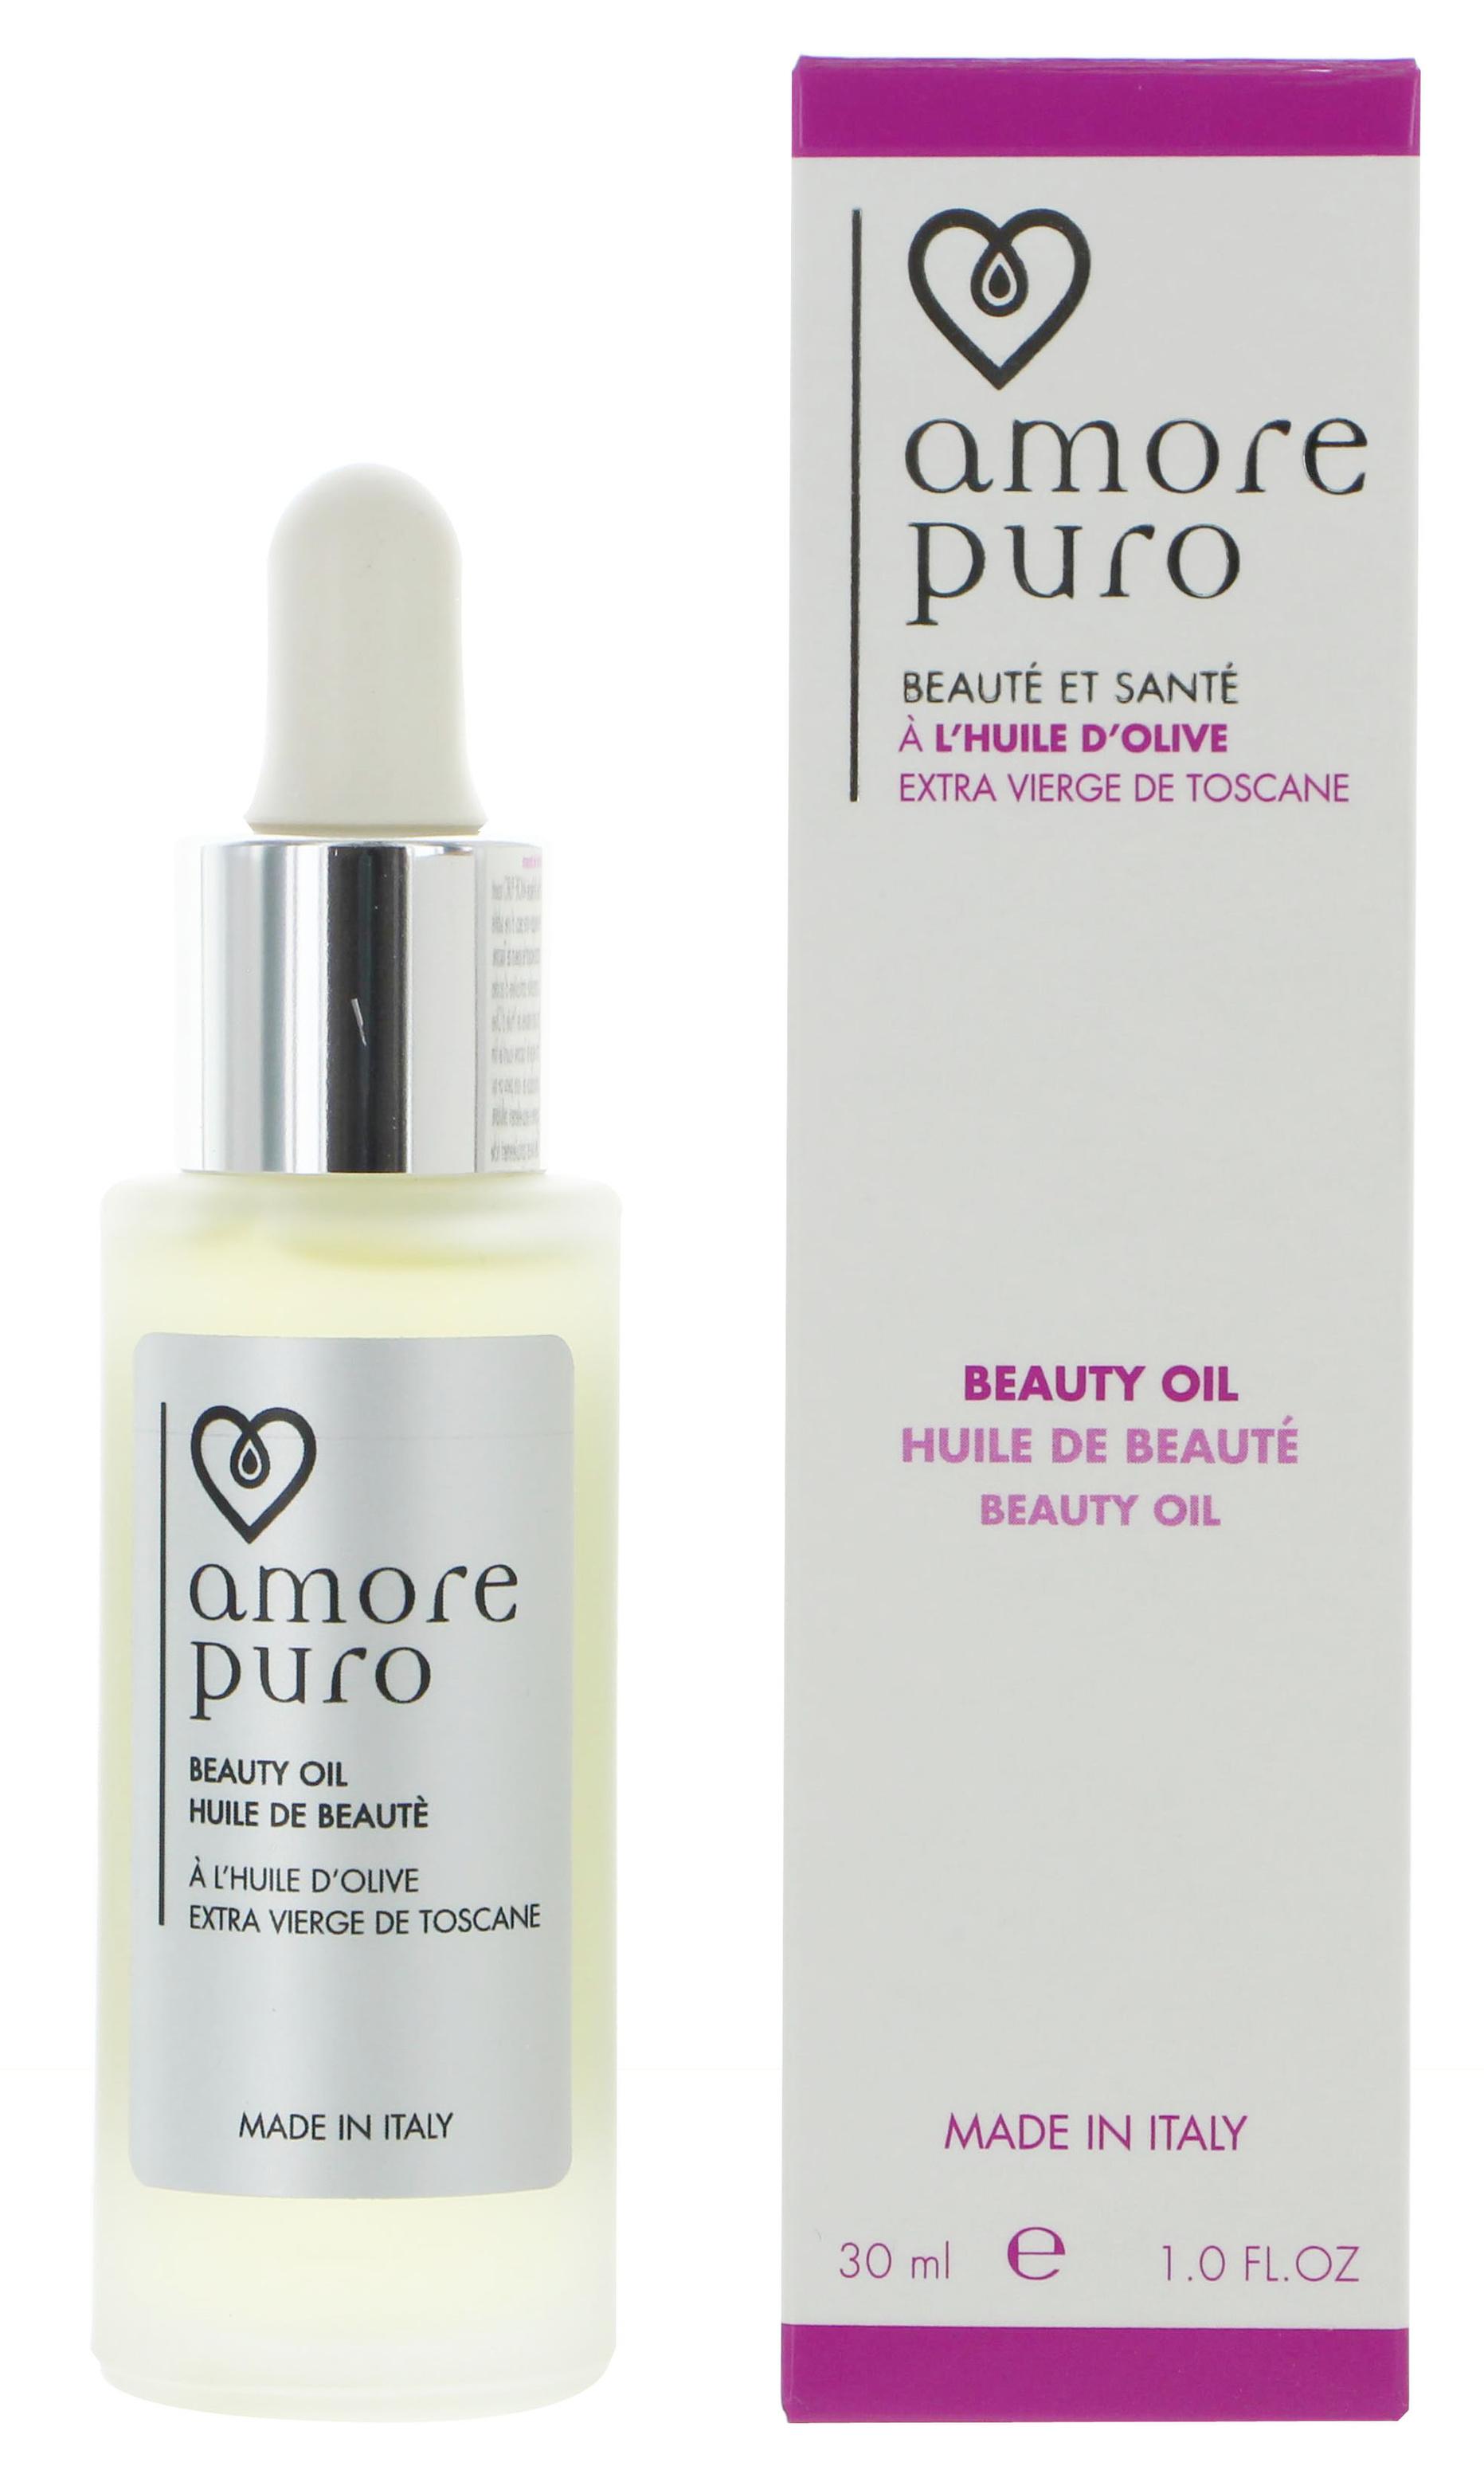 huile-beaute-elixir-amore-puro